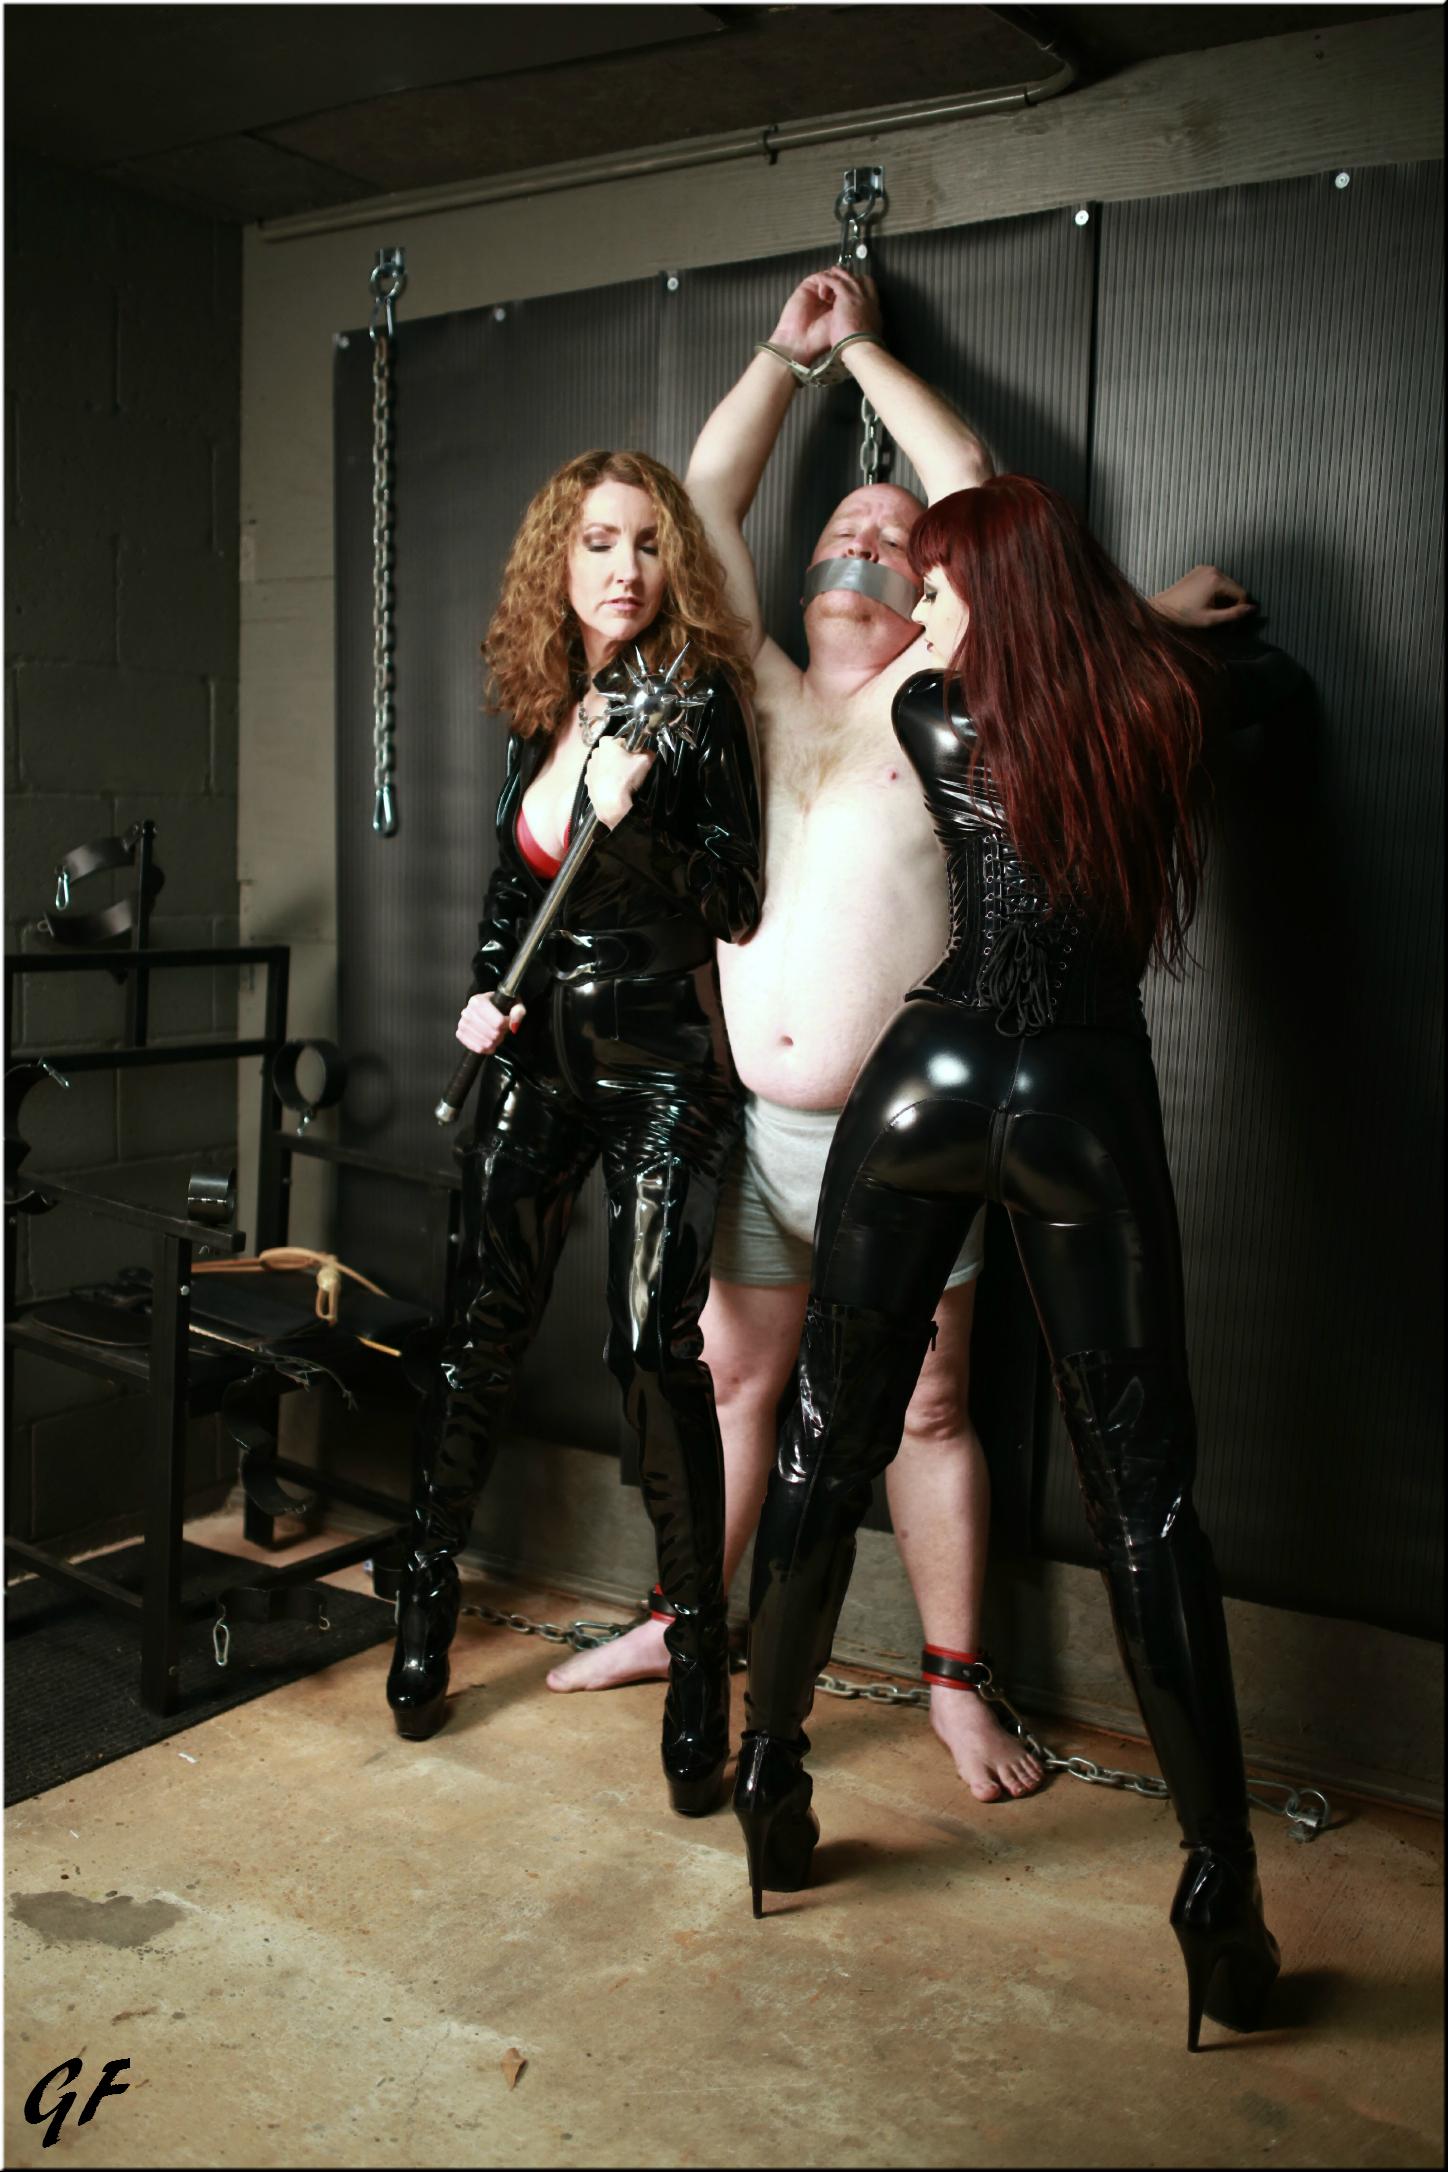 Asian mistress my cane has no mercy fm - 2 part 6